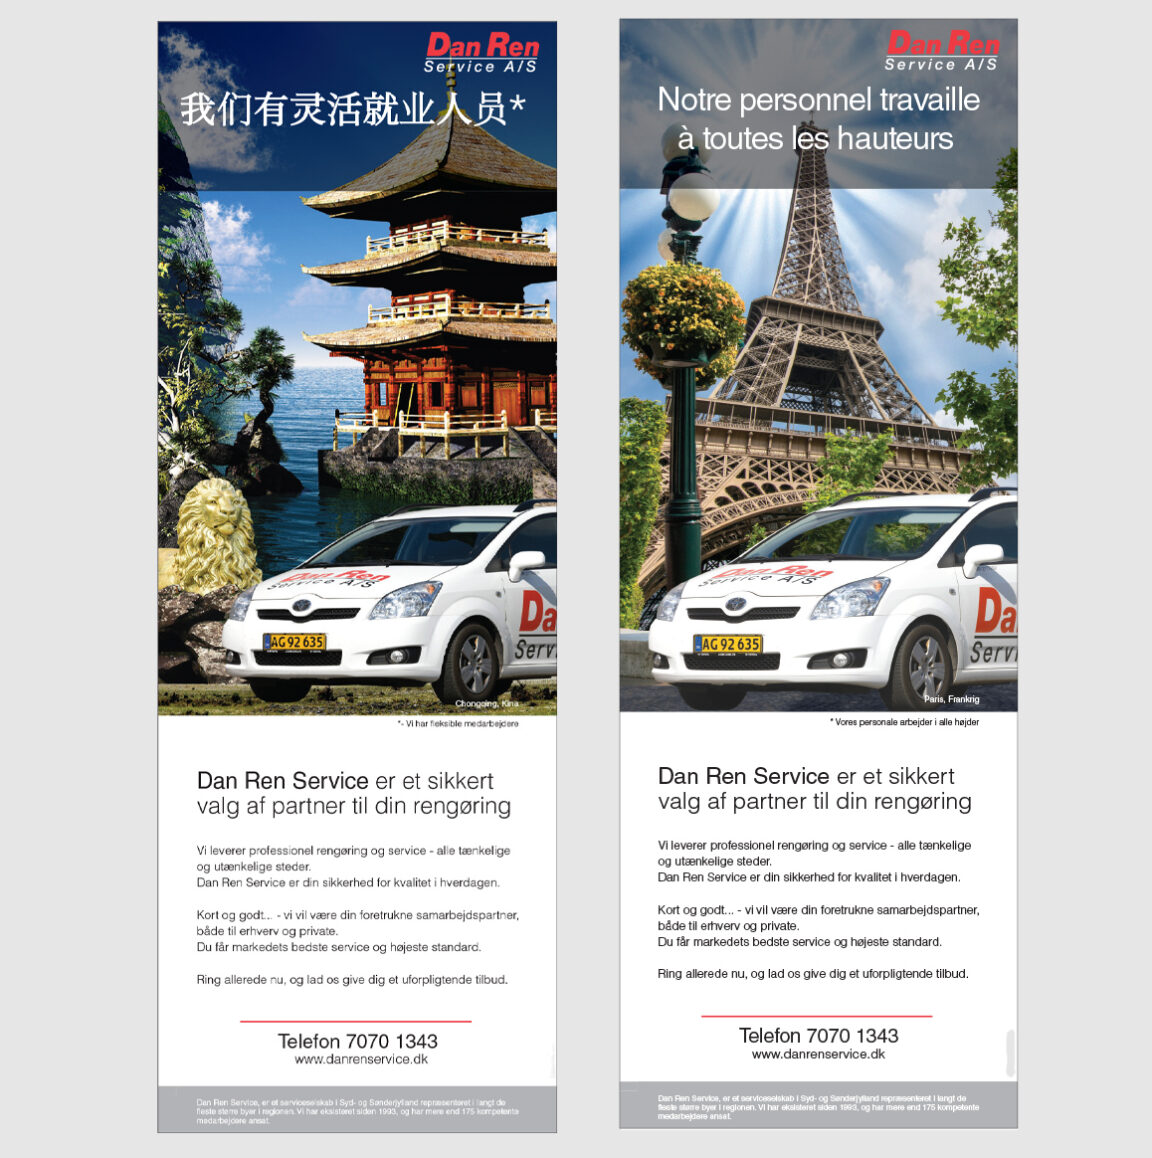 Dan-Ren-Service-profil annonce Frankrig, Kina Linda Kongerslev Grafisk Design